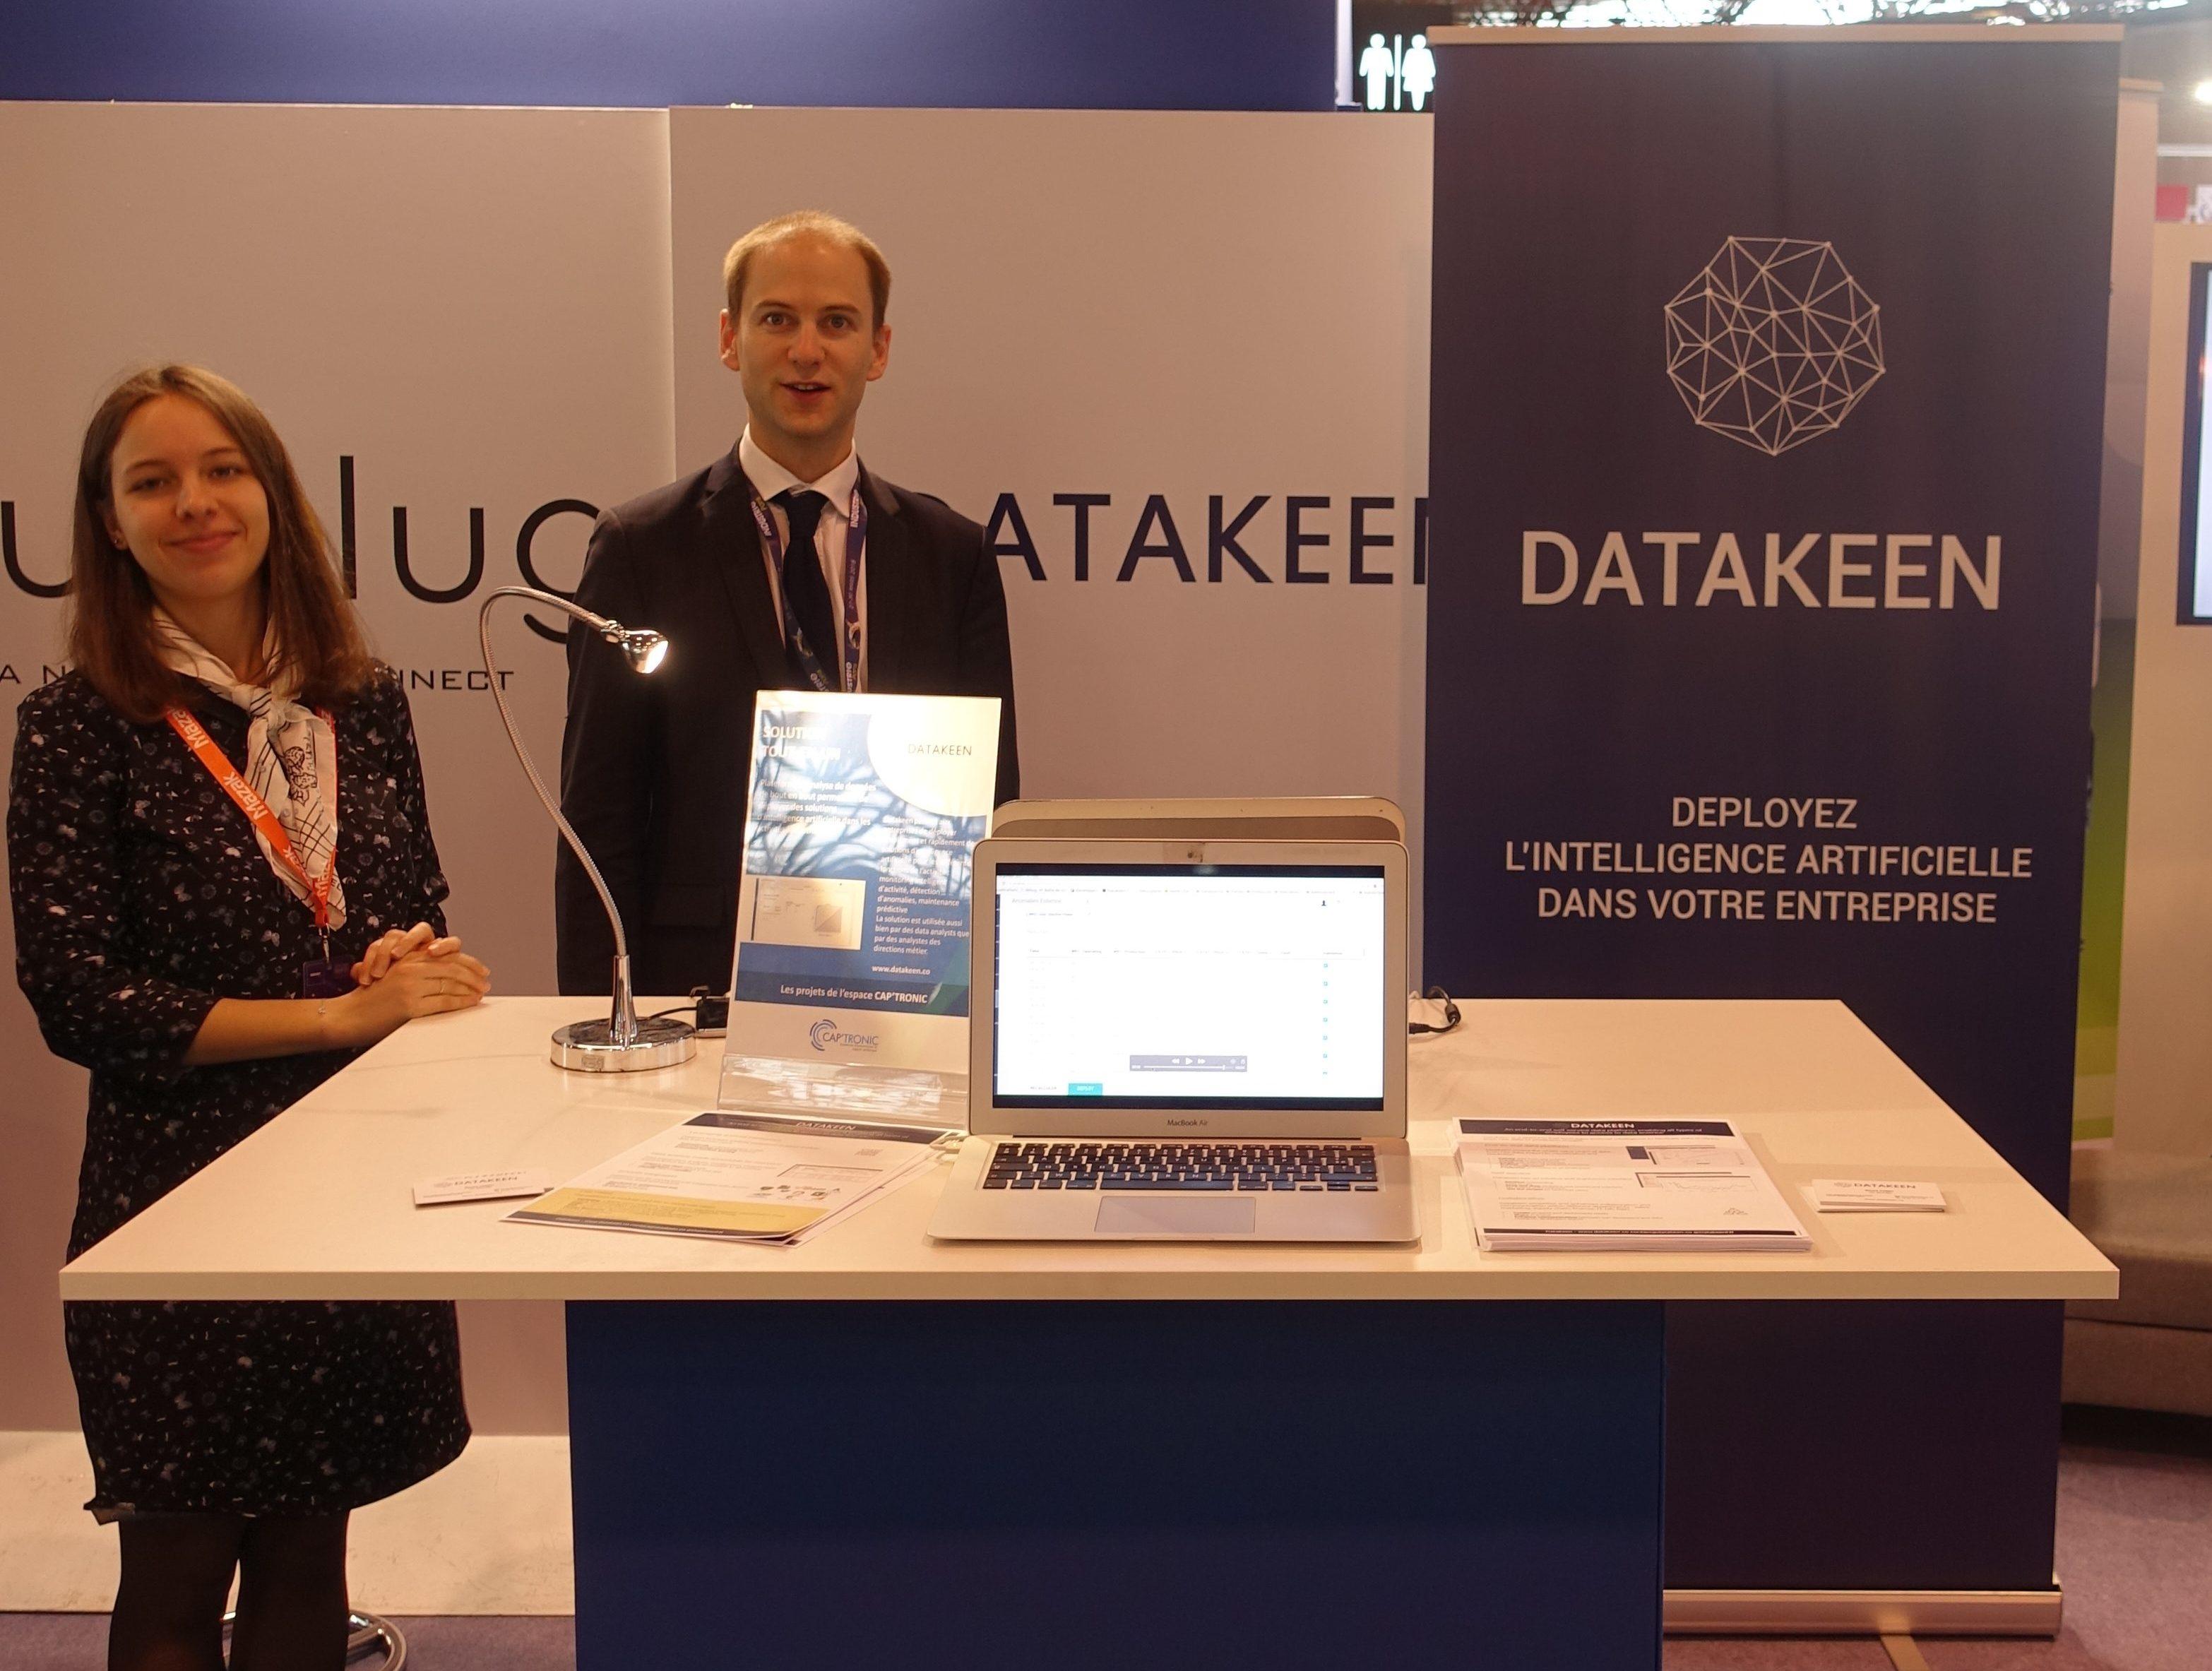 Datakeen au salon Big Data Paris 2018